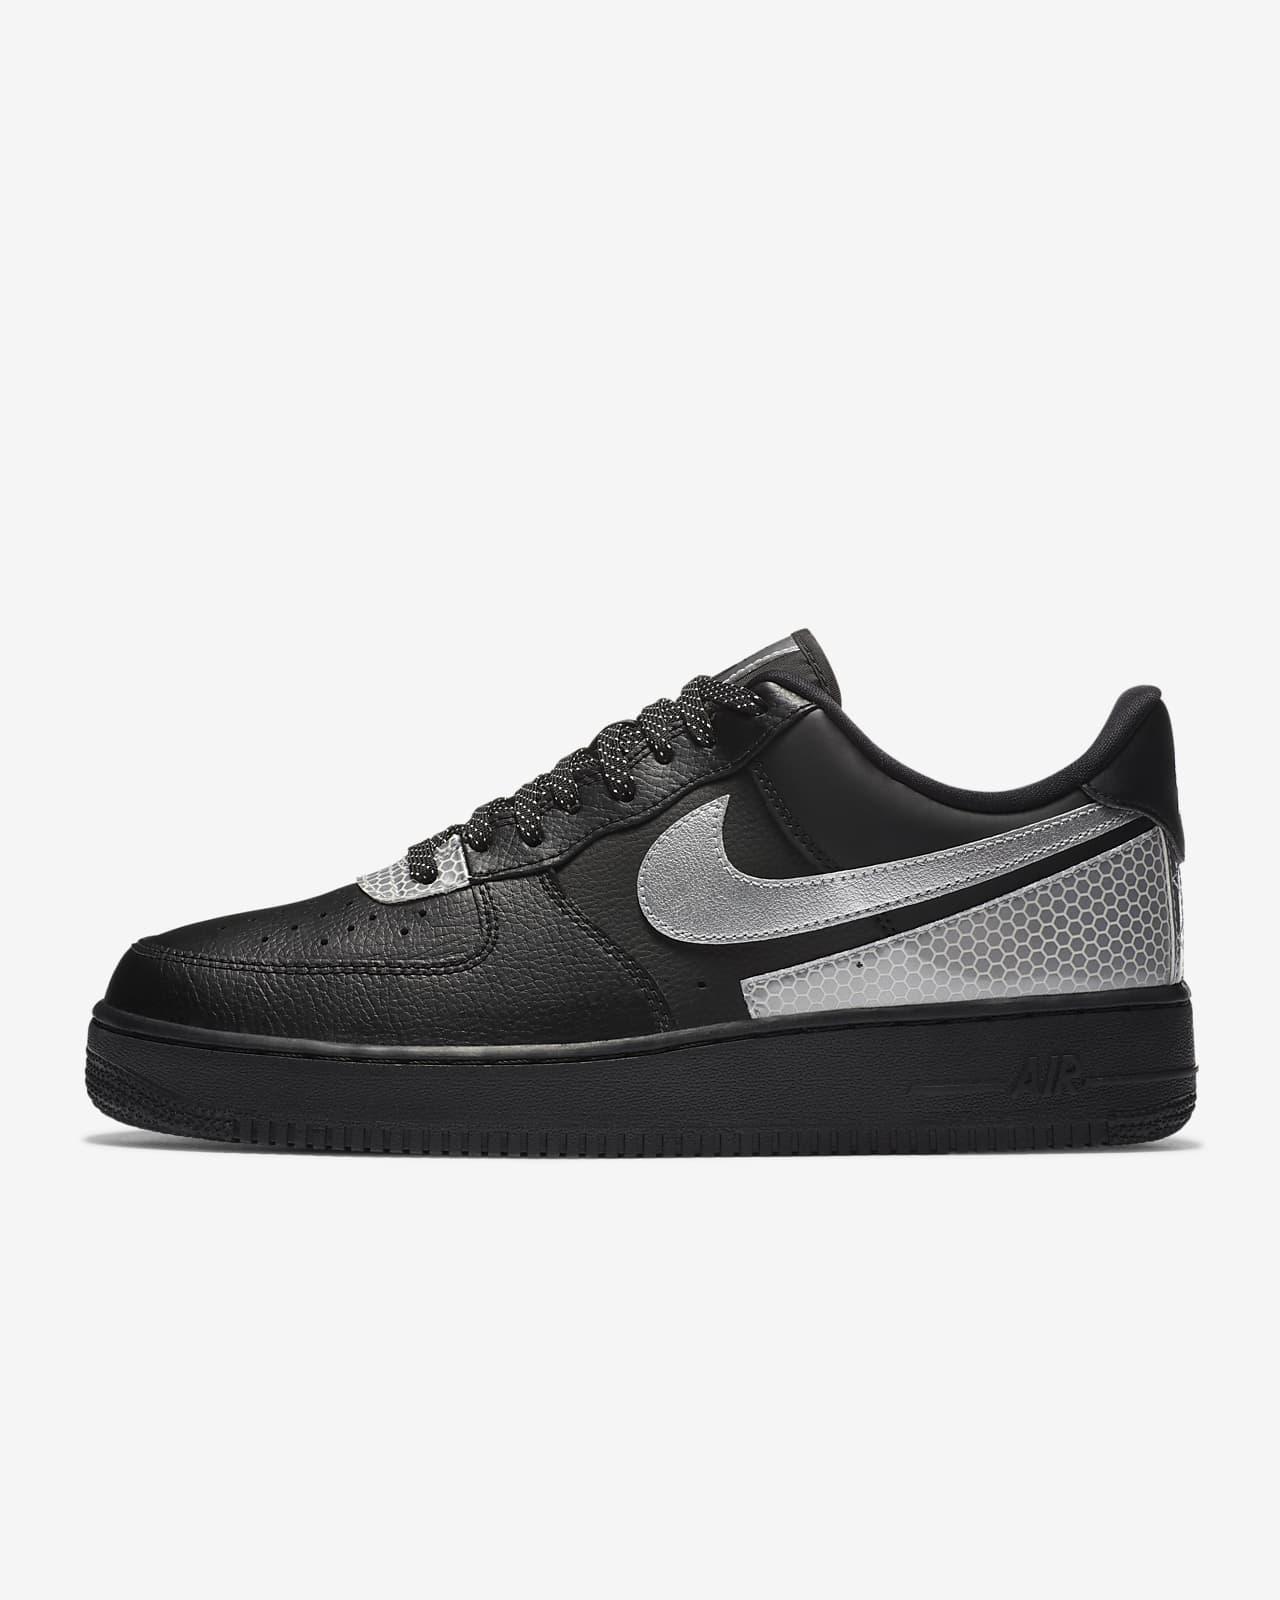 Nike Air Force 1 '07 LV8 Herrenschuh